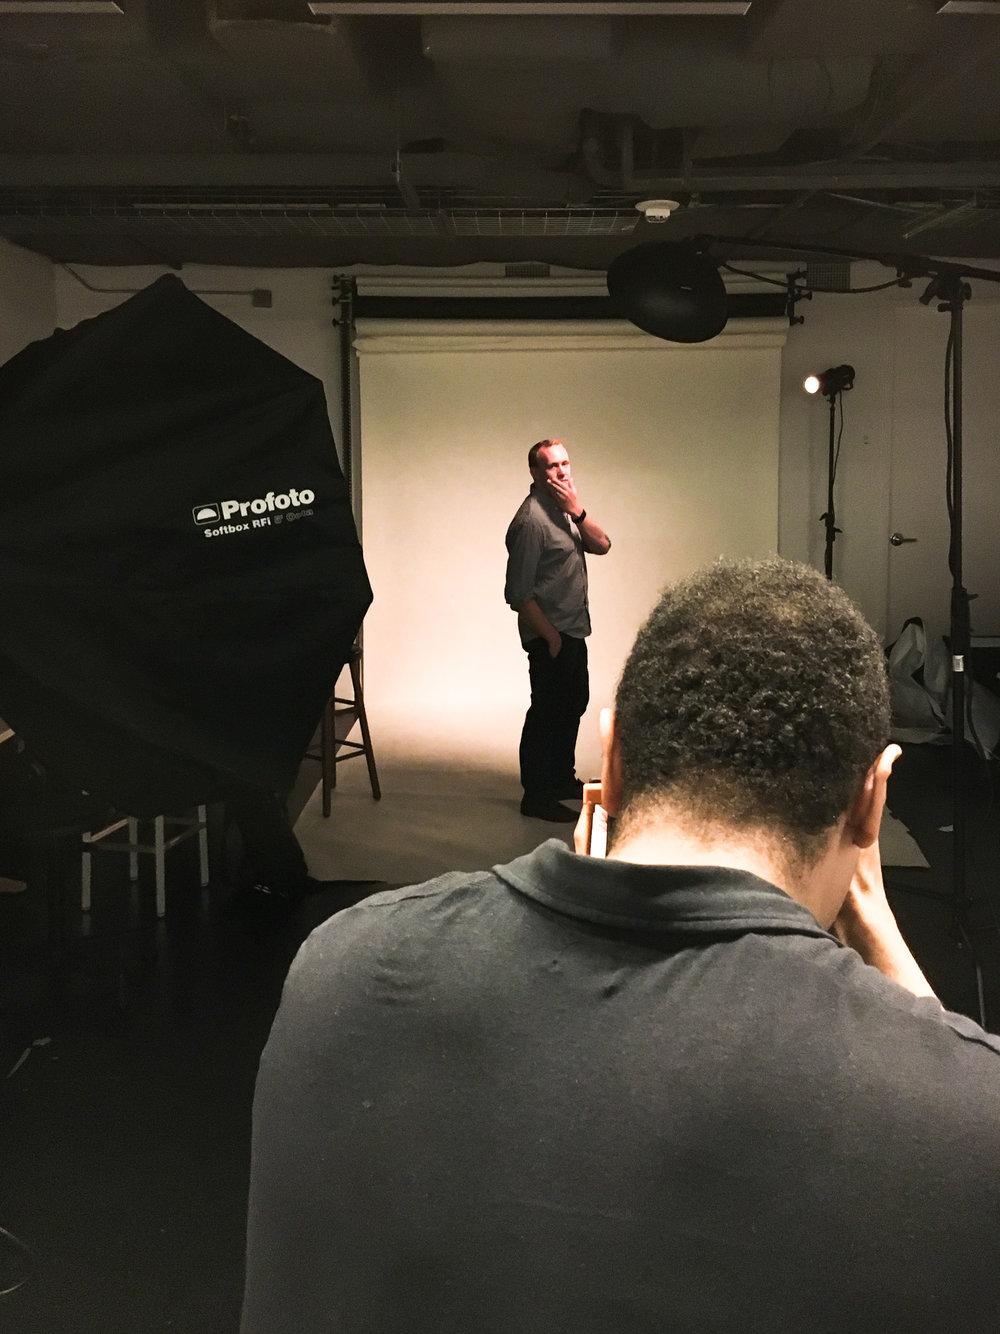 Marvin Joseph (@king_marvino) photographing Austin Graff (@austinkgraff)